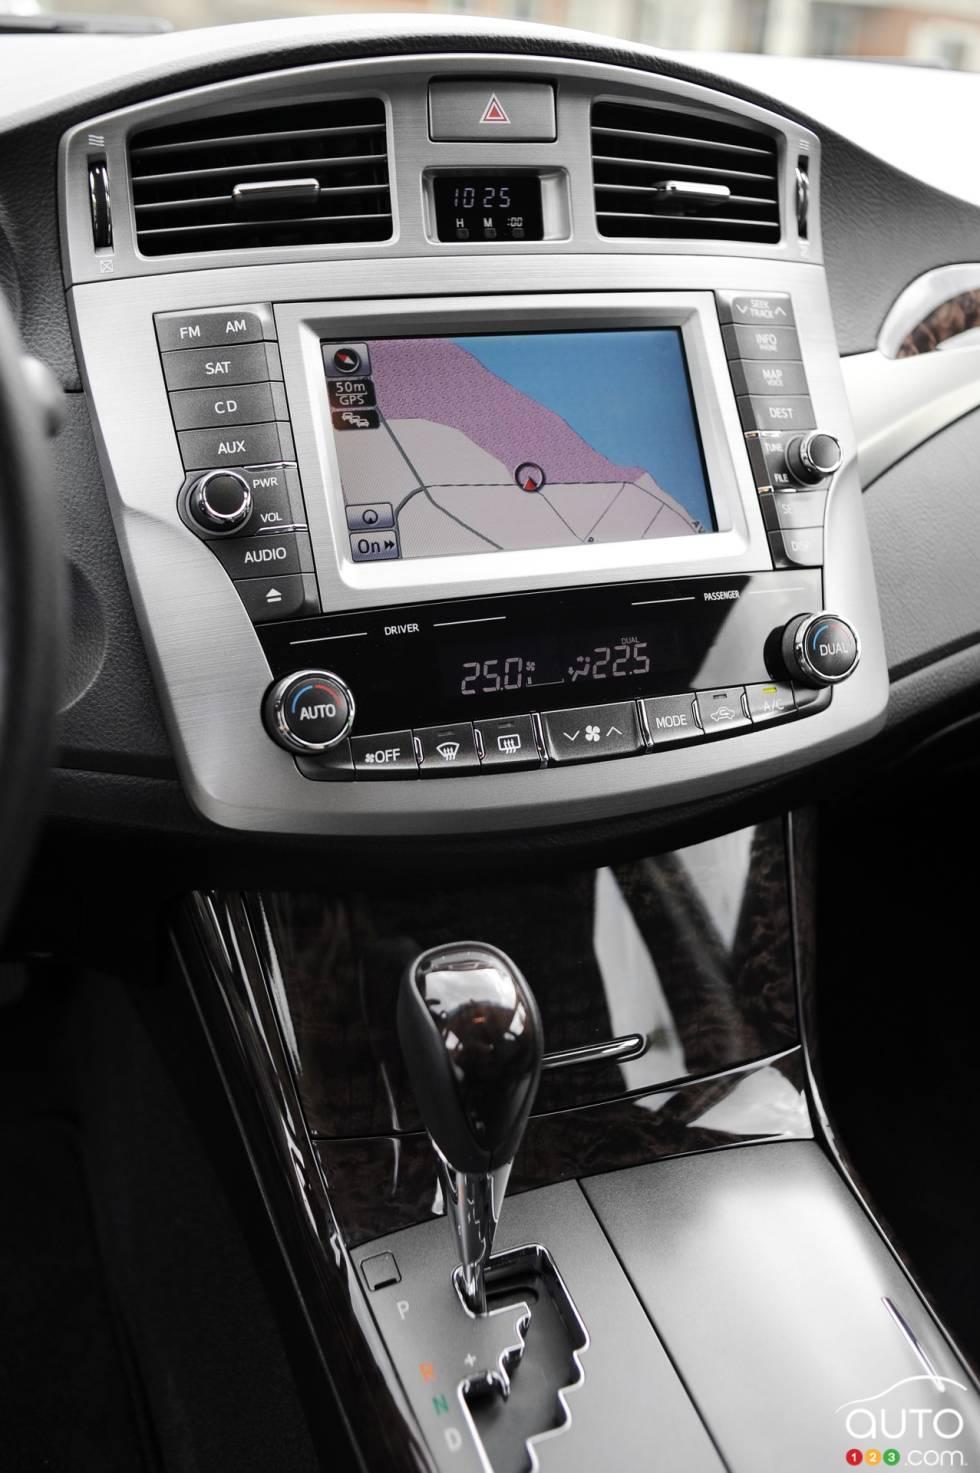 Navigation system screen